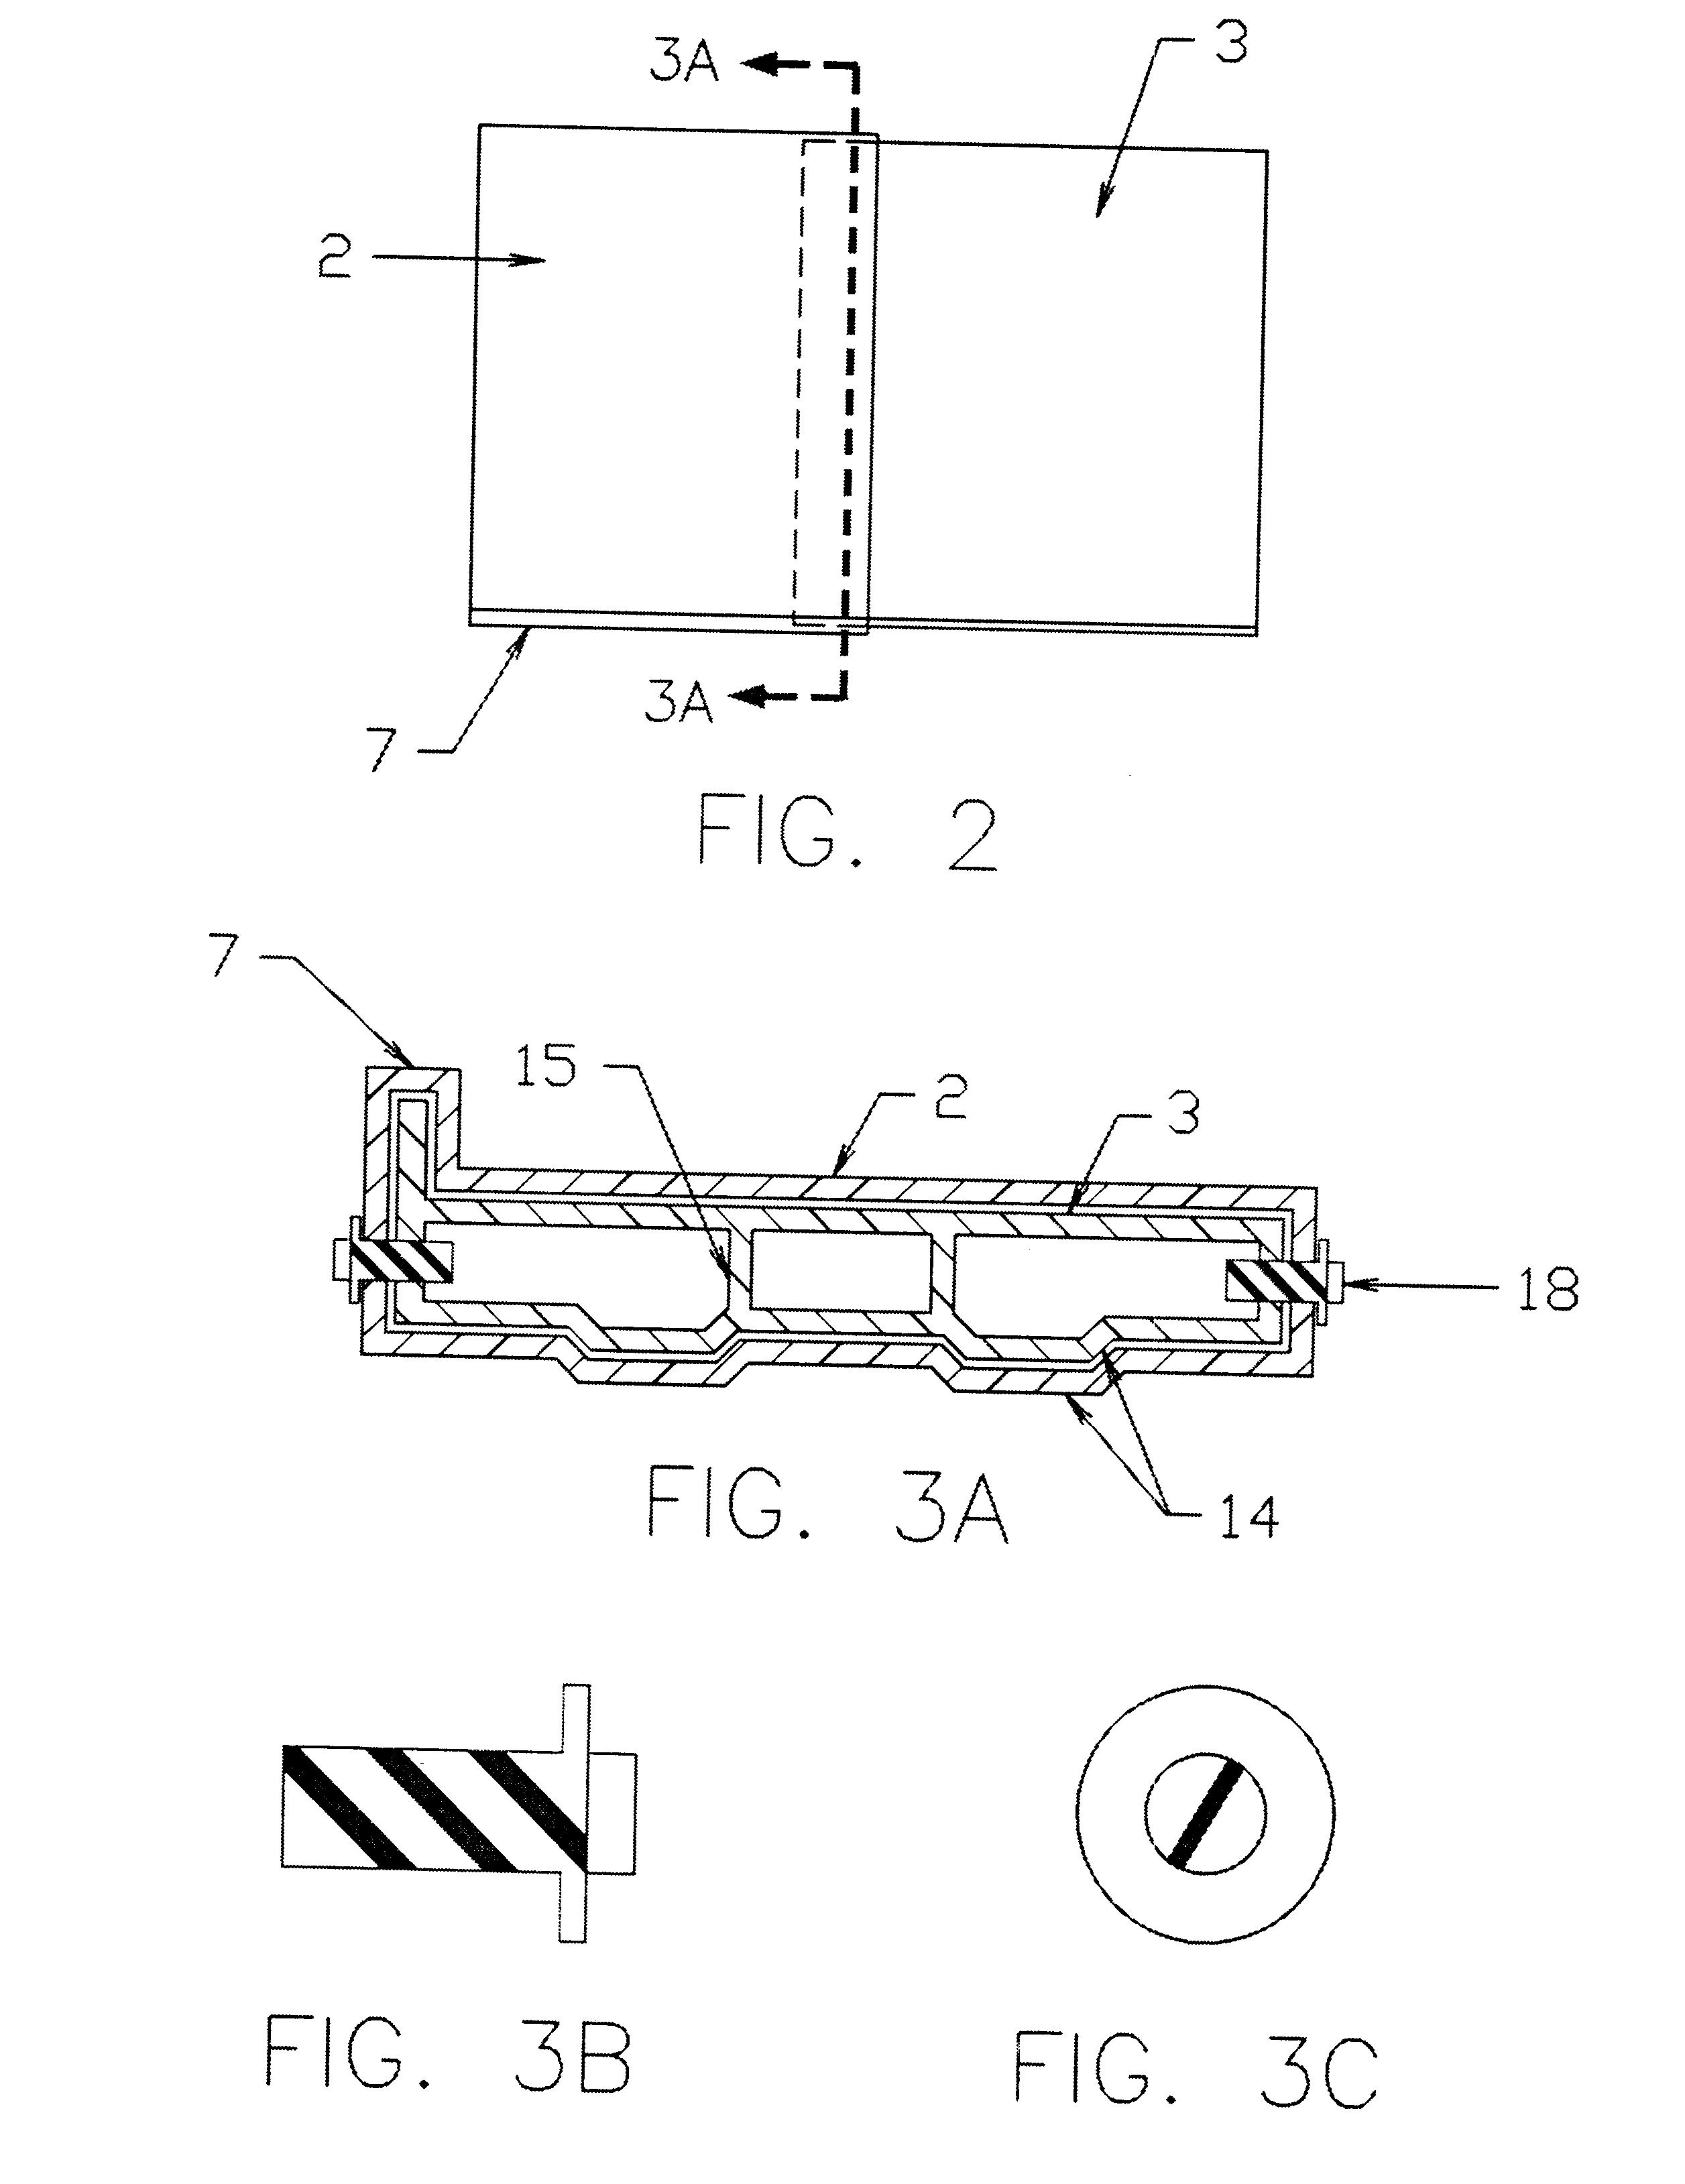 Jobsite Blueprint Table Patent US6289824 - Collapsible jobsite plan table - Google Patents